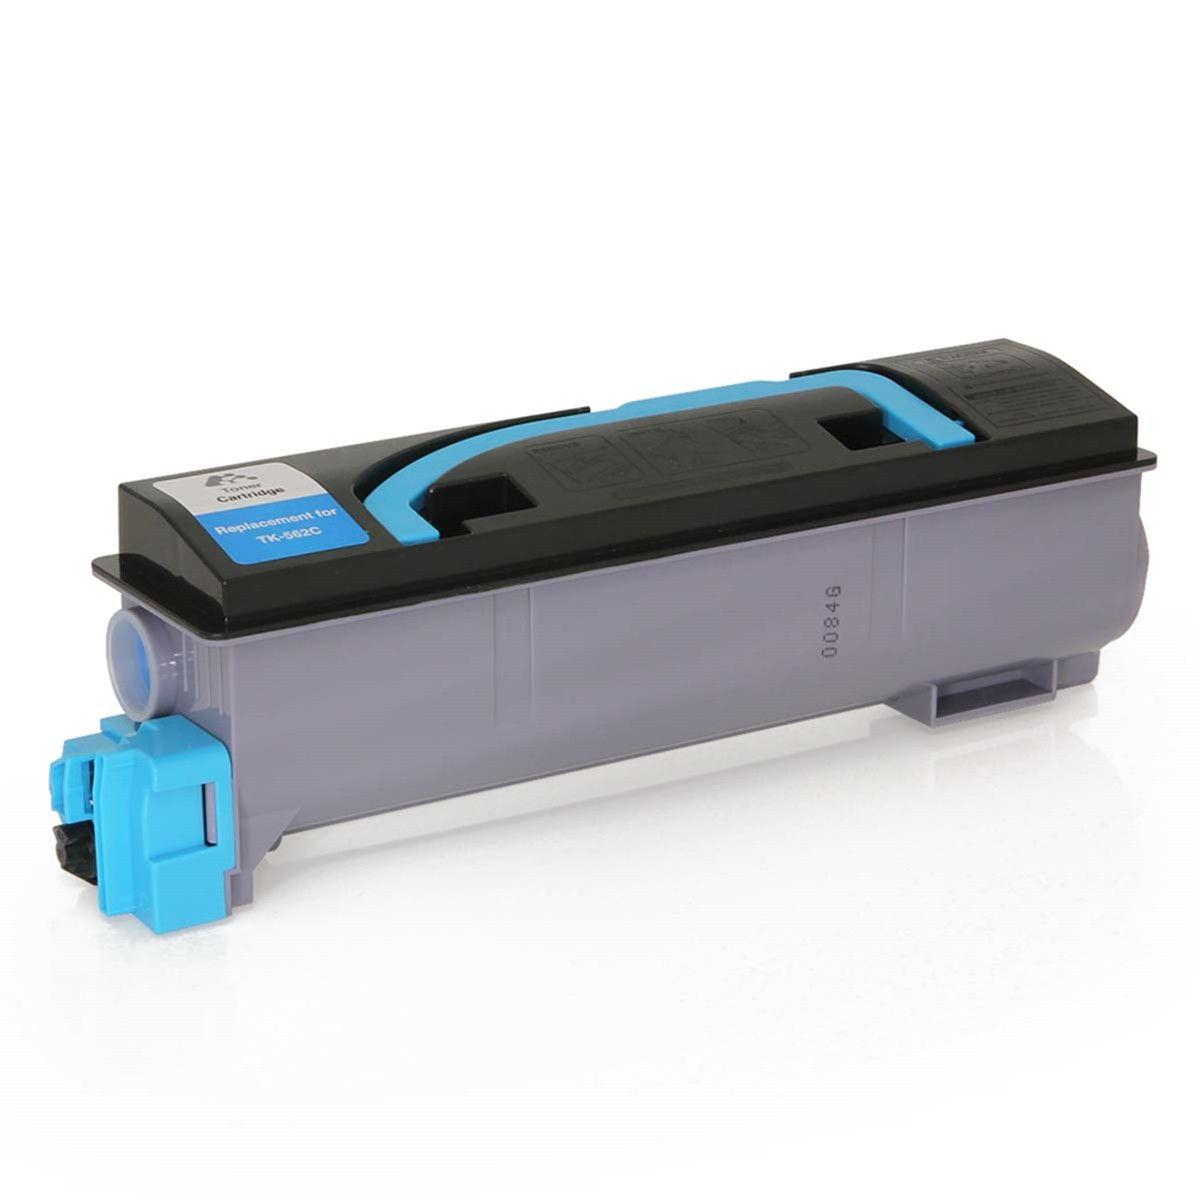 Toner compatível com KYOCERA TK-562C FS C5300 FS C5300DN FS C5350 C5350DN Ciano 10.000 Páginas - Cartucho & Cia